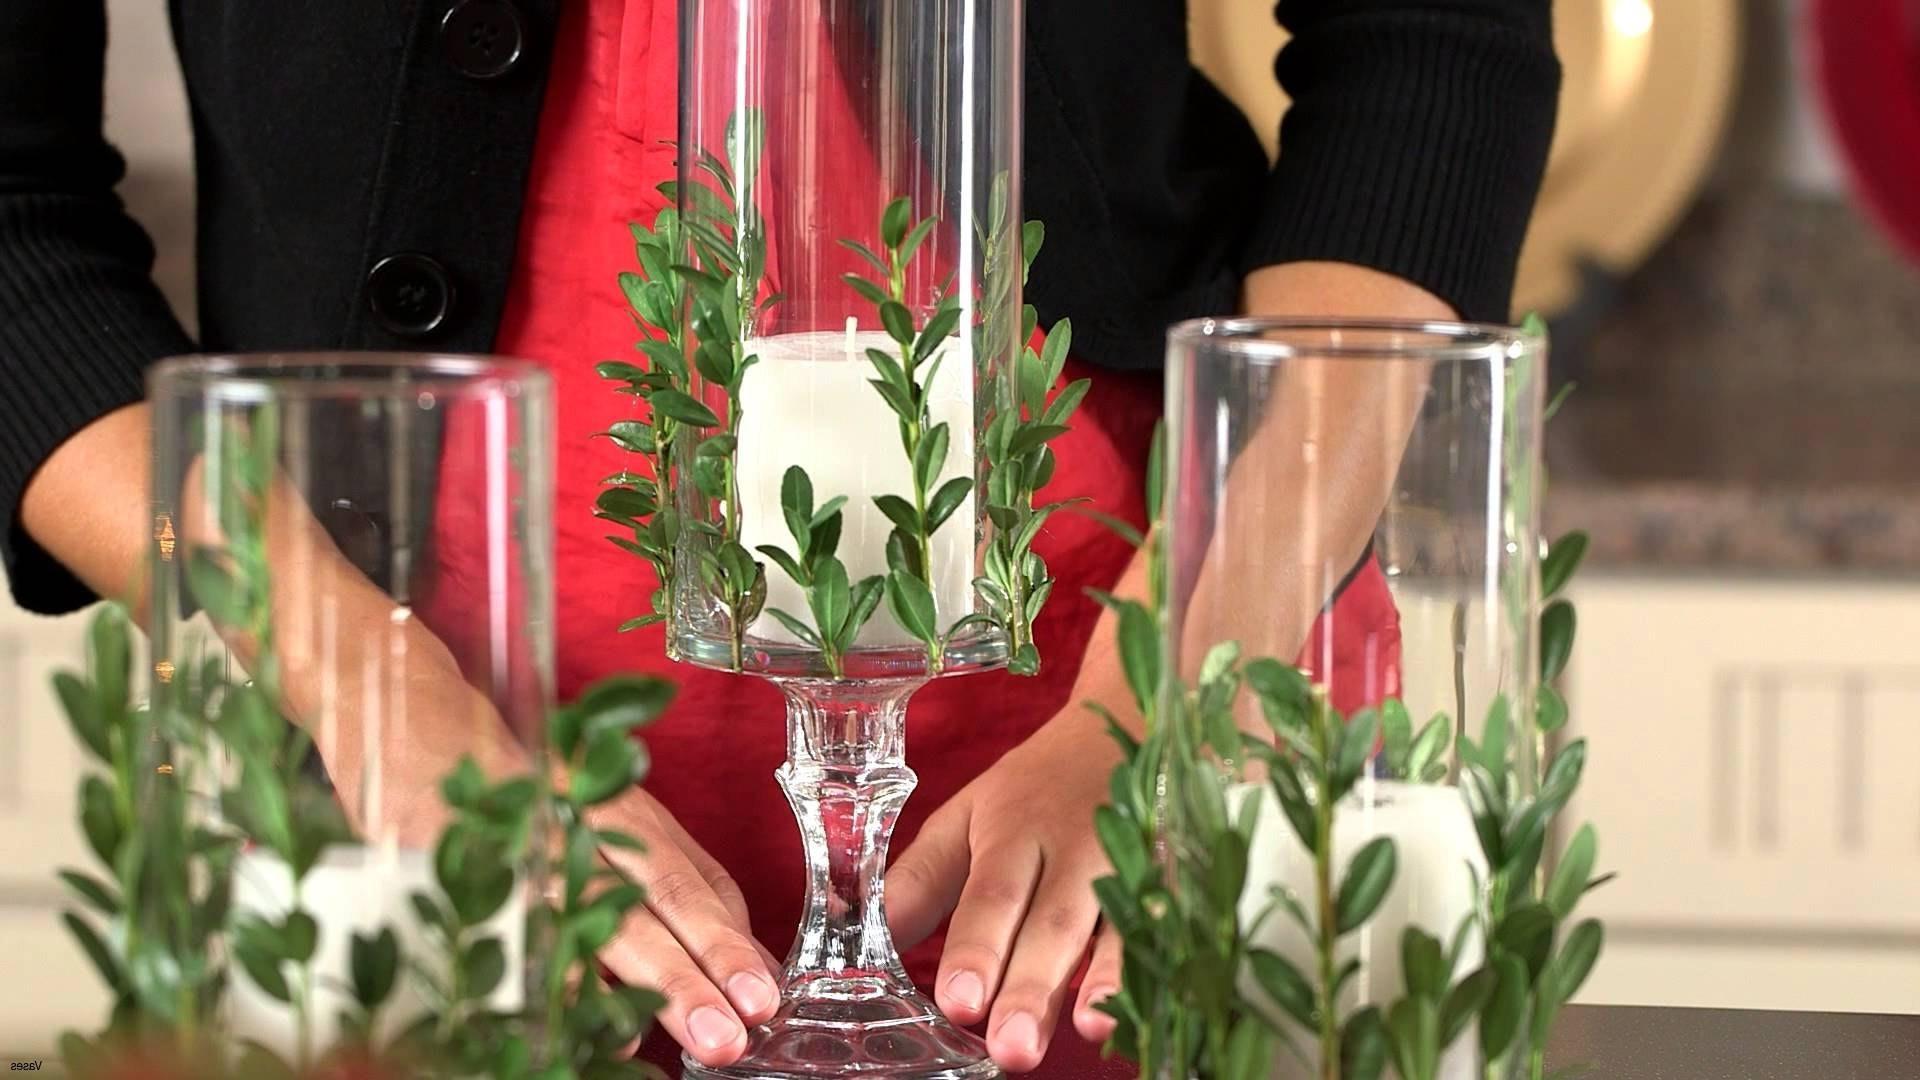 tall clear plastic cylinder vases of 19 elegant glass cylinder vases dollar tree bogekompresorturkiye com in dollar tree wedding decorations awesome h vases dollar vase i 0d inspiration wedding centerpiece vases